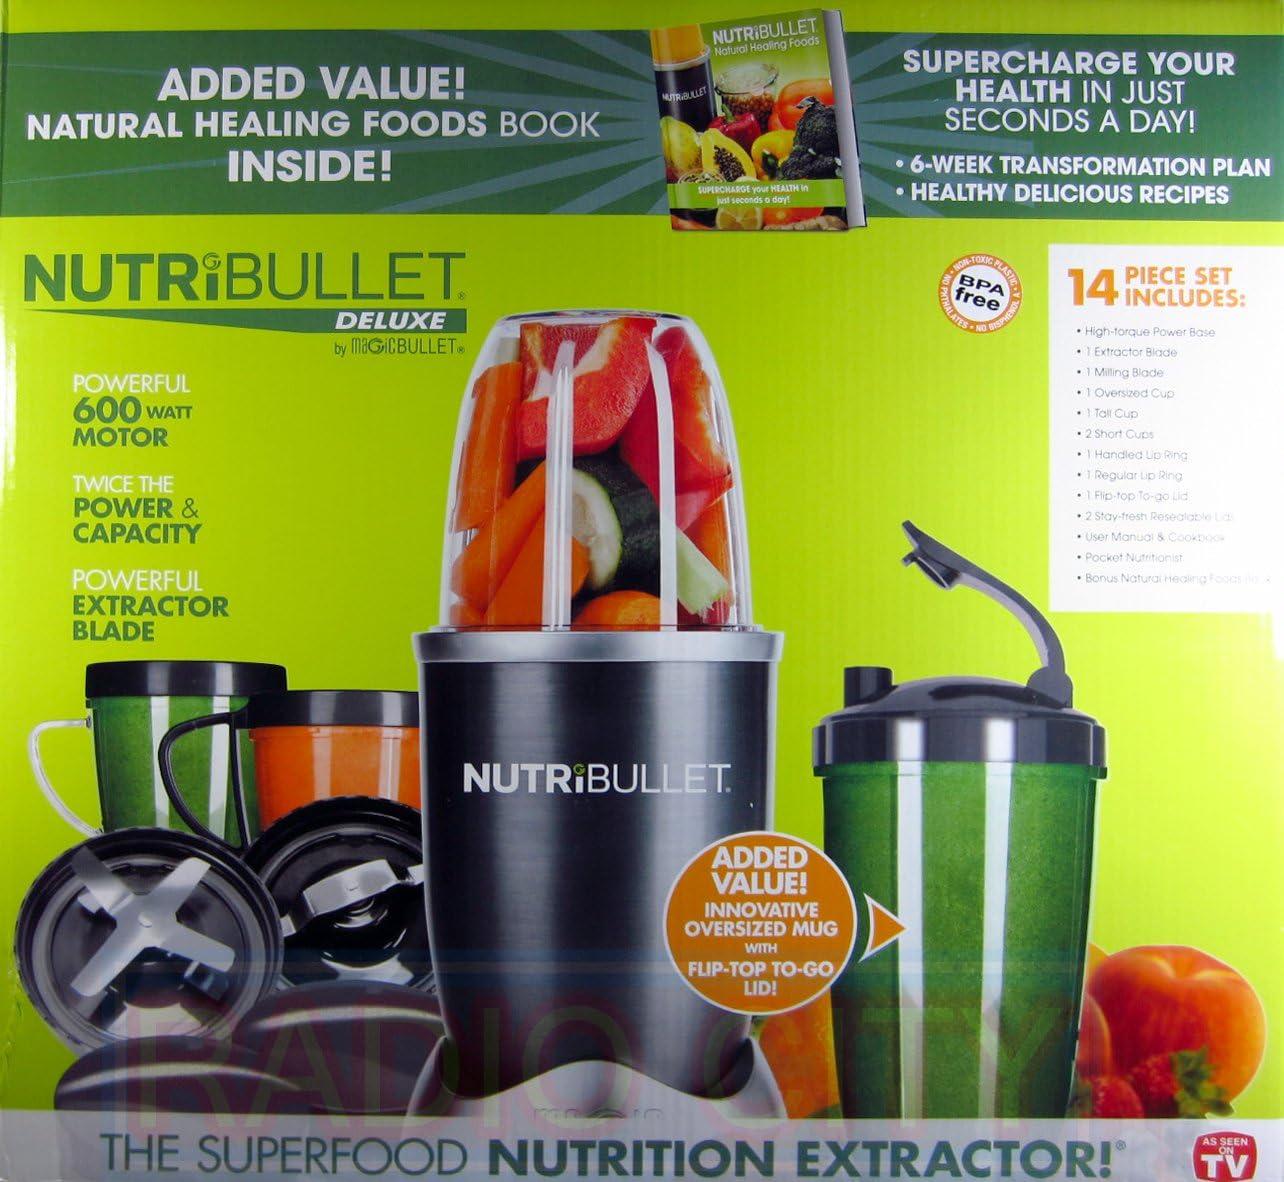 Nutribullet 14 Piece Nutrition Extractor 600W Blender